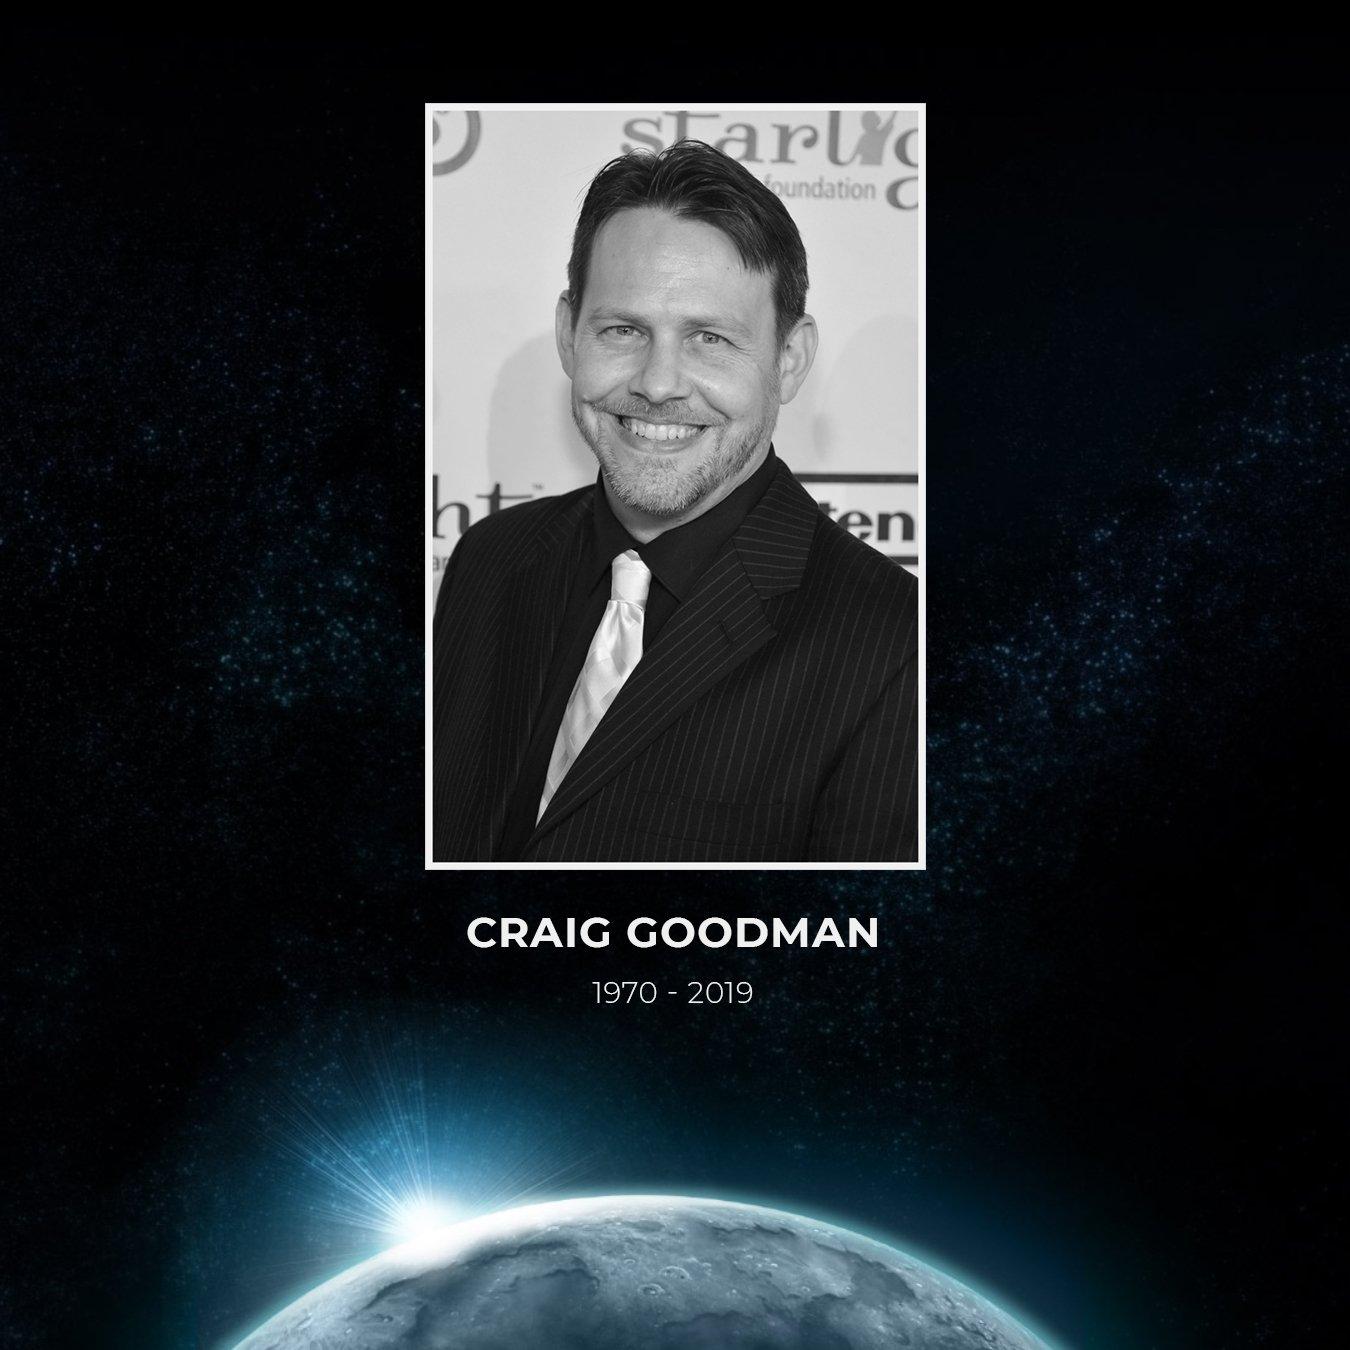 Insomniac老員工Craig Goodman不幸離世 曾參與《漫威蜘蛛俠》制作